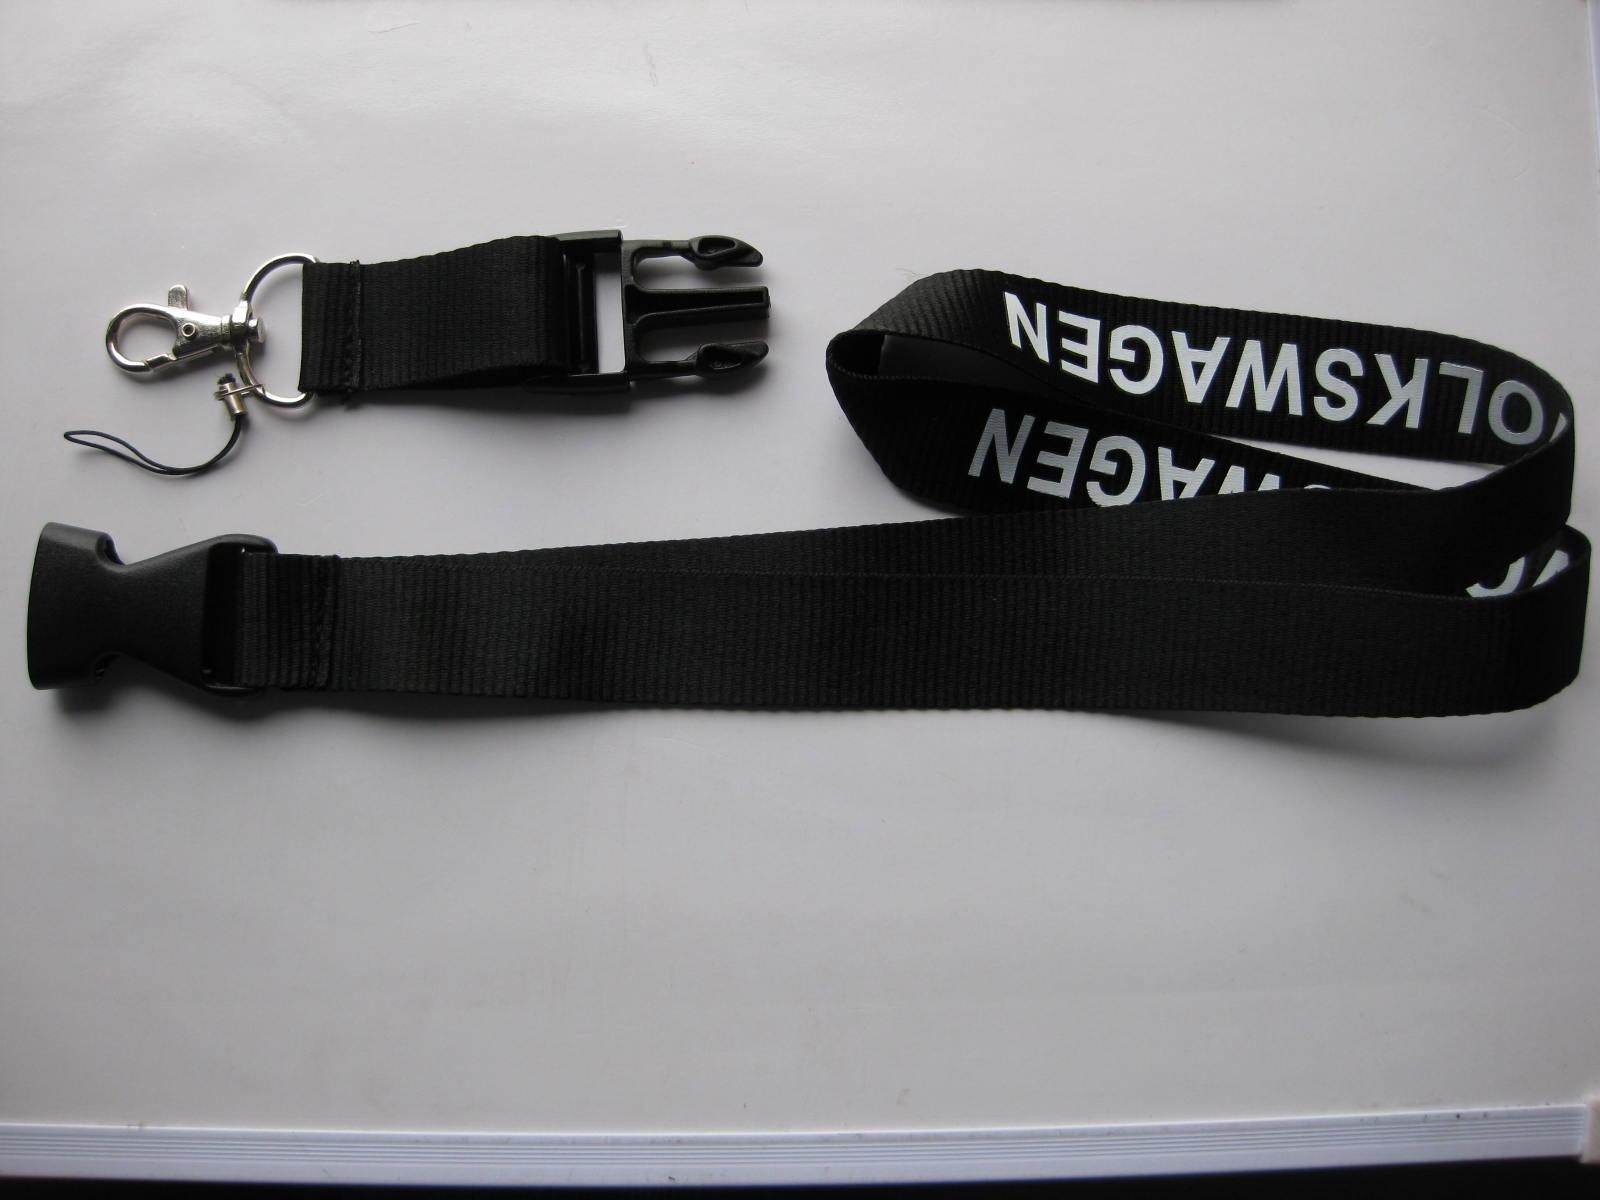 Lanyard sleutelhanger zwarte sleutelhangers voor golf auto sleutelhanger